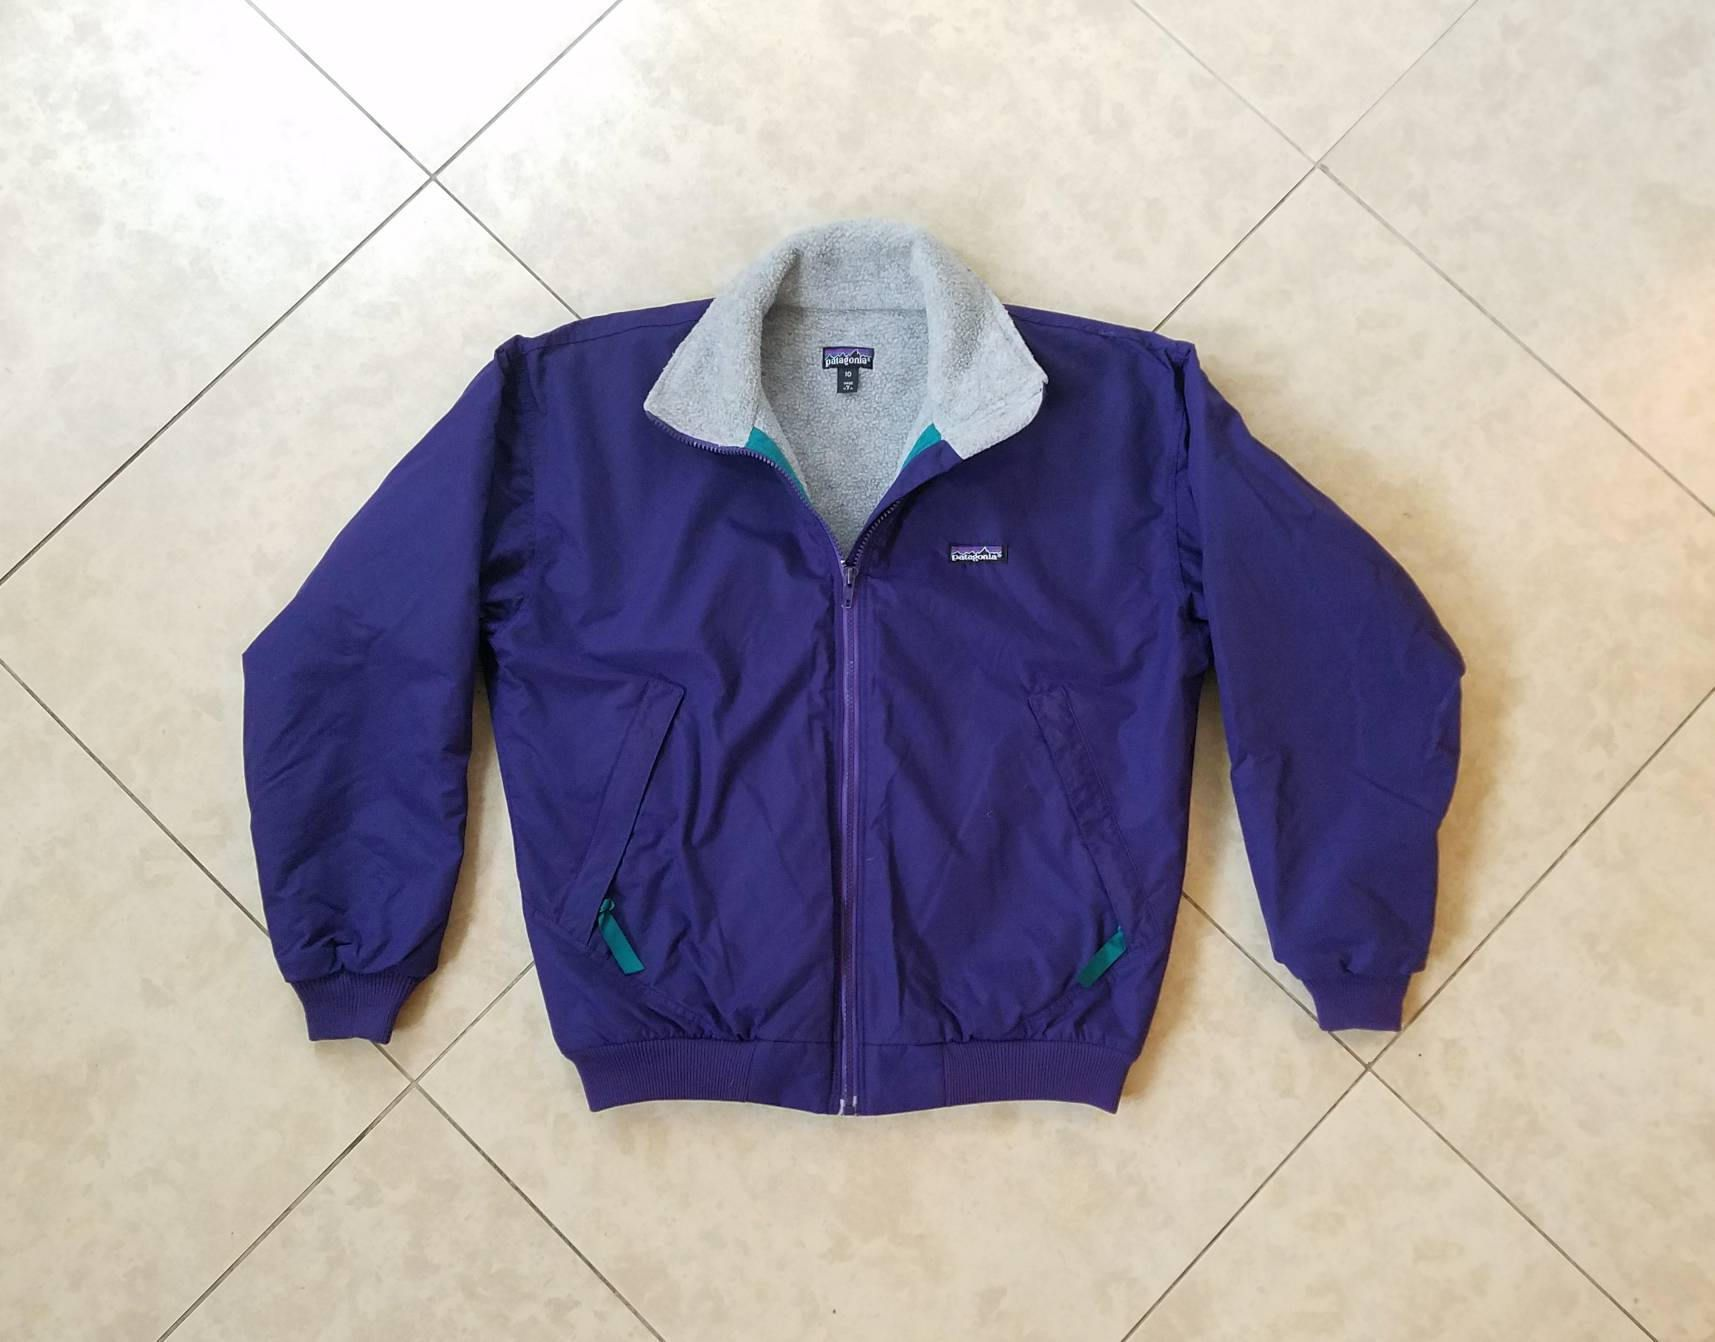 Vintage womenus medium large patagania outerwear fitted purple